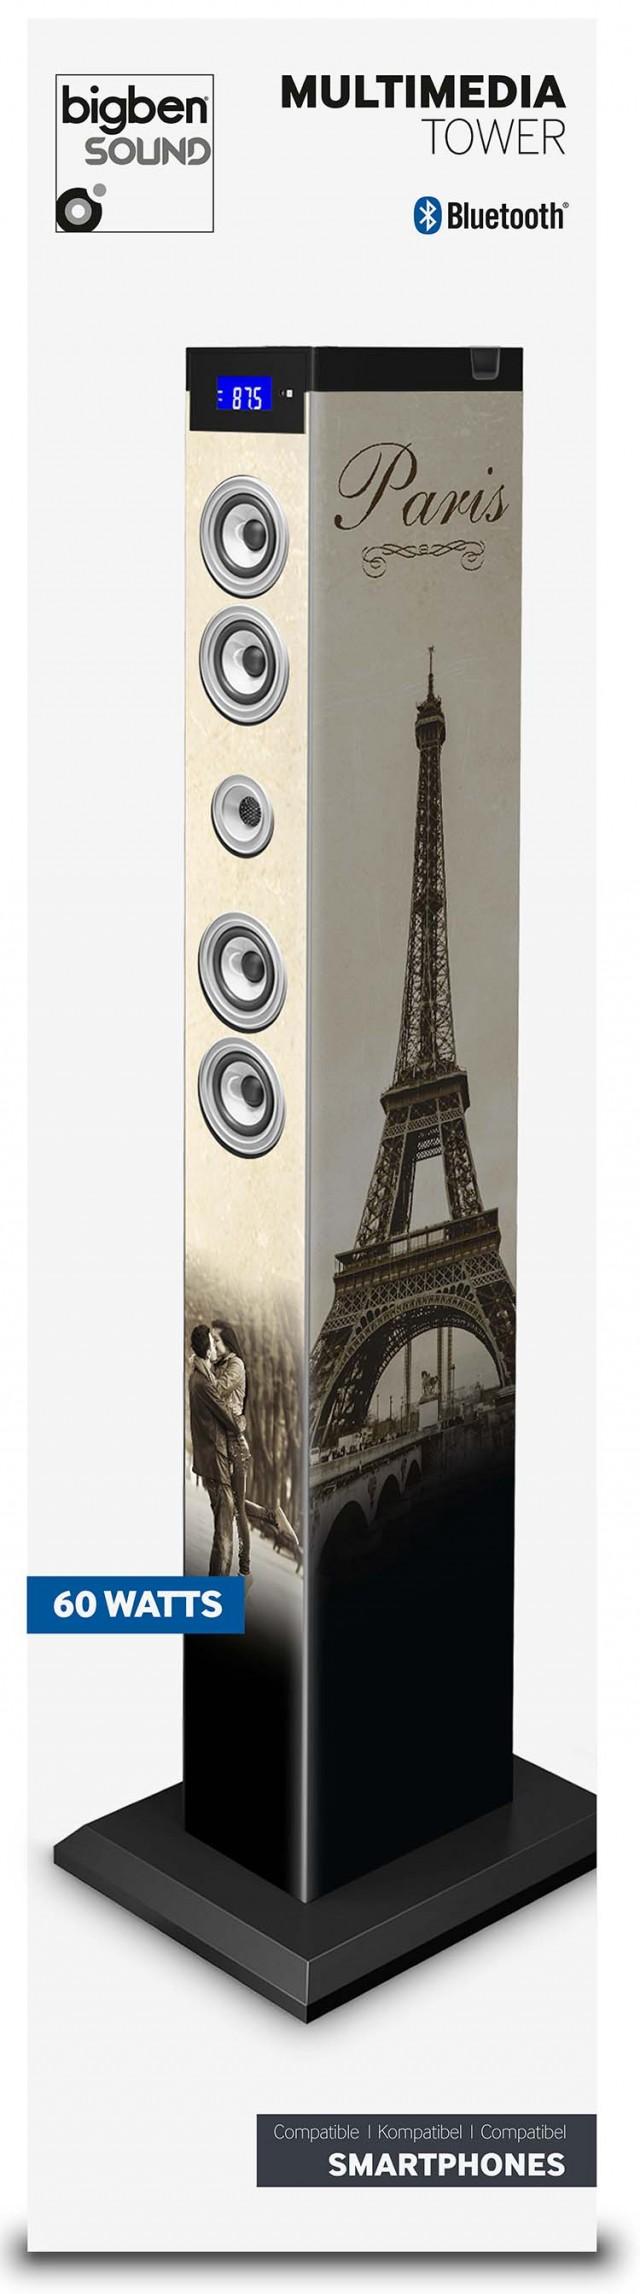 Sound Tower TW9 – Paris 2 - Packshot